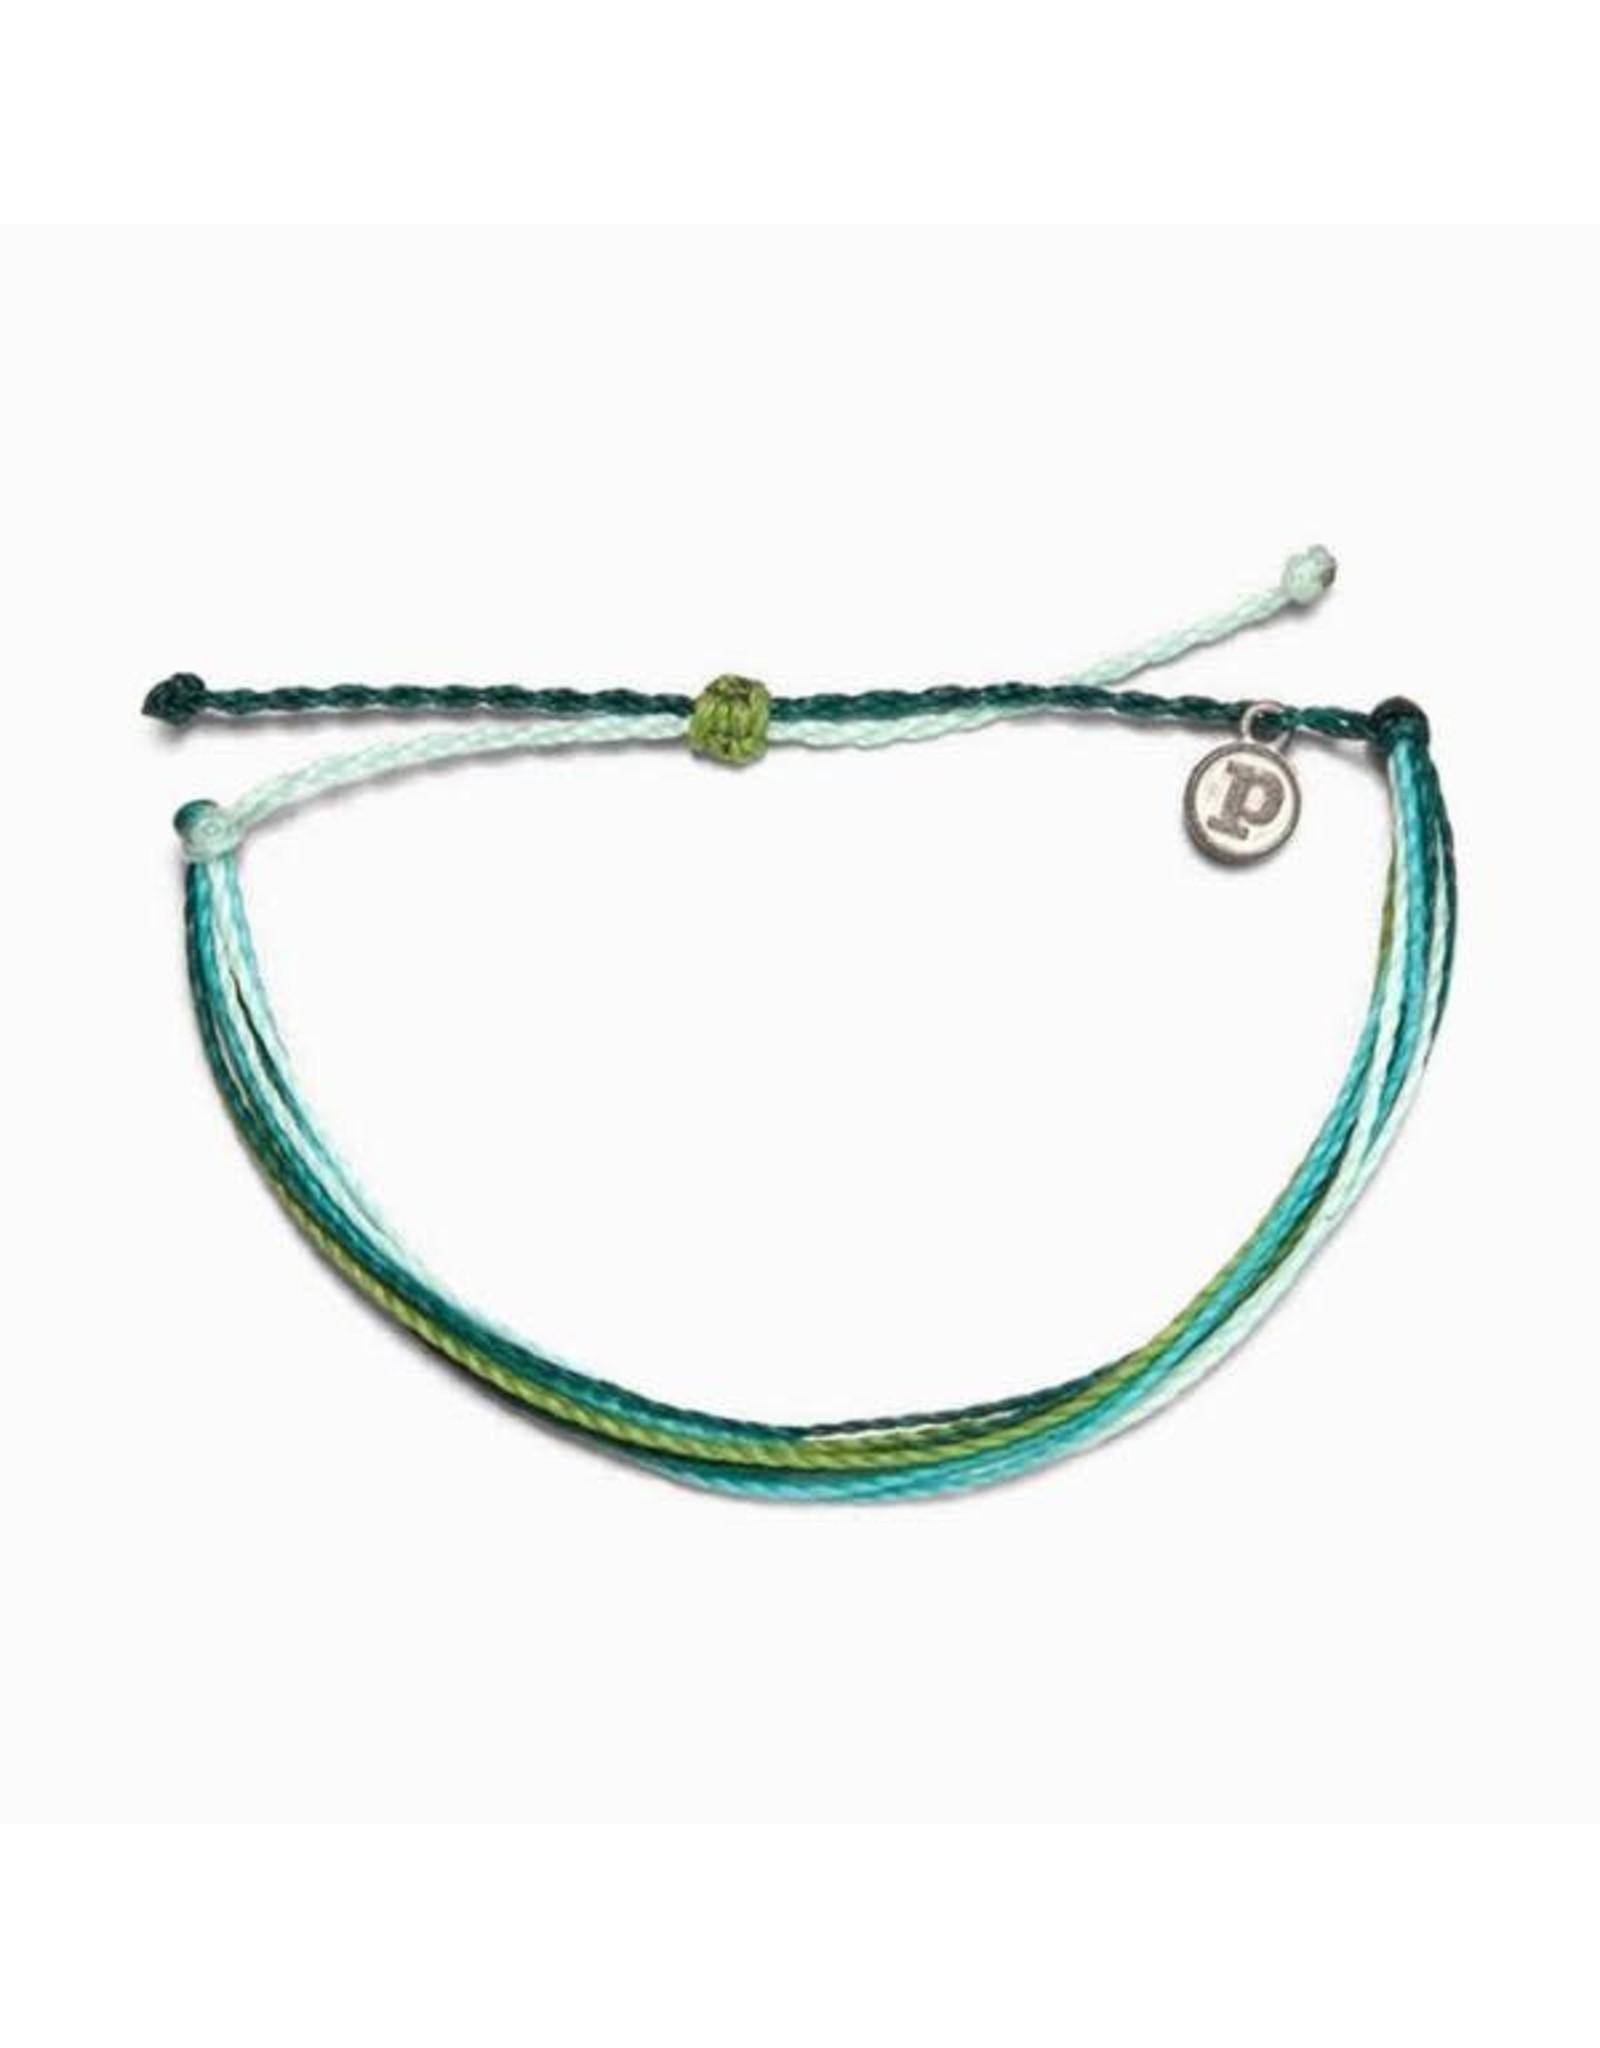 Puravida Bracelets Bright Original Coral Reefin